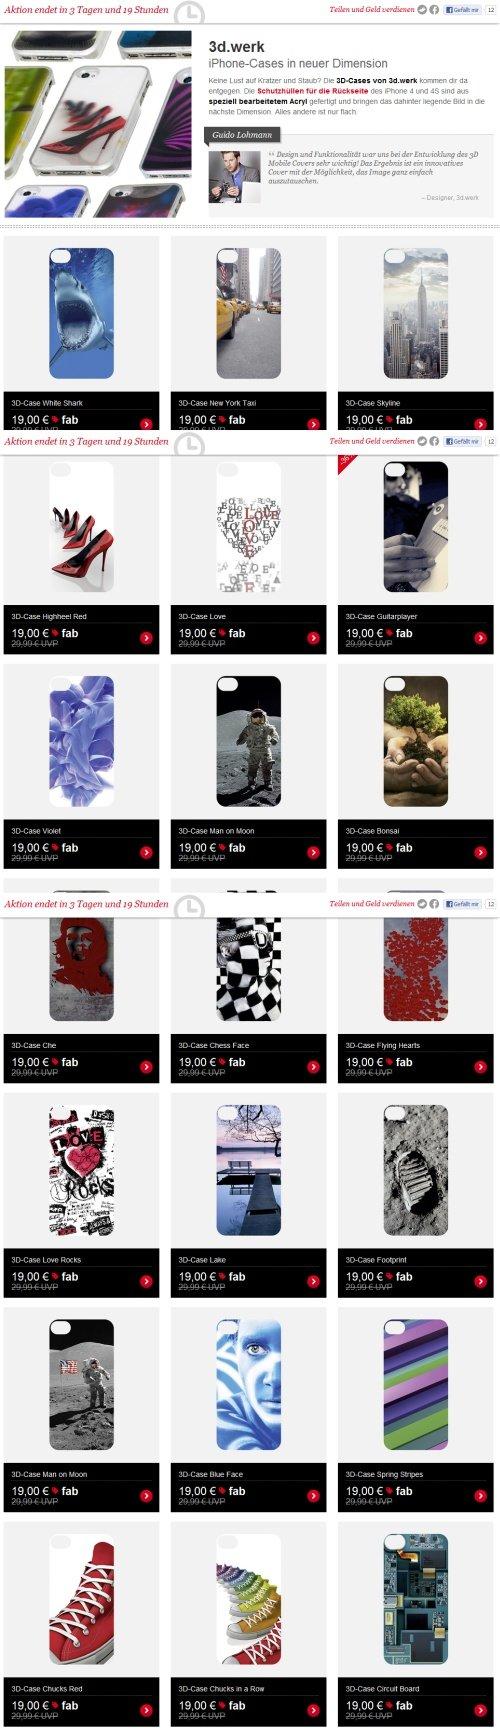 Fab 3d werk iPhone-Cases